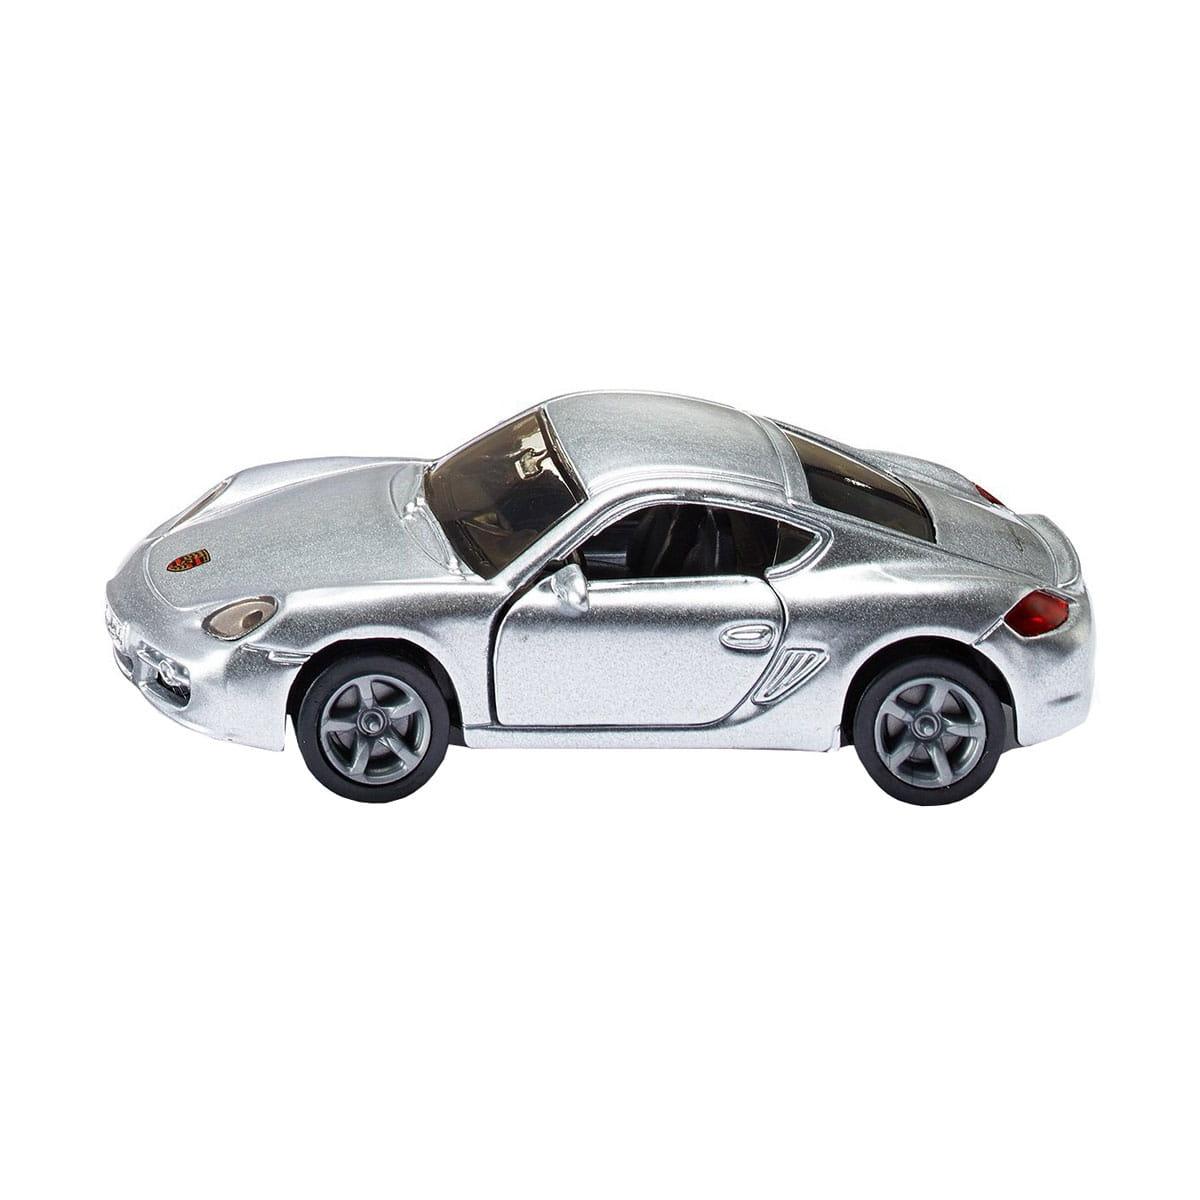 Машина Siku 1433 Porsche Cayman